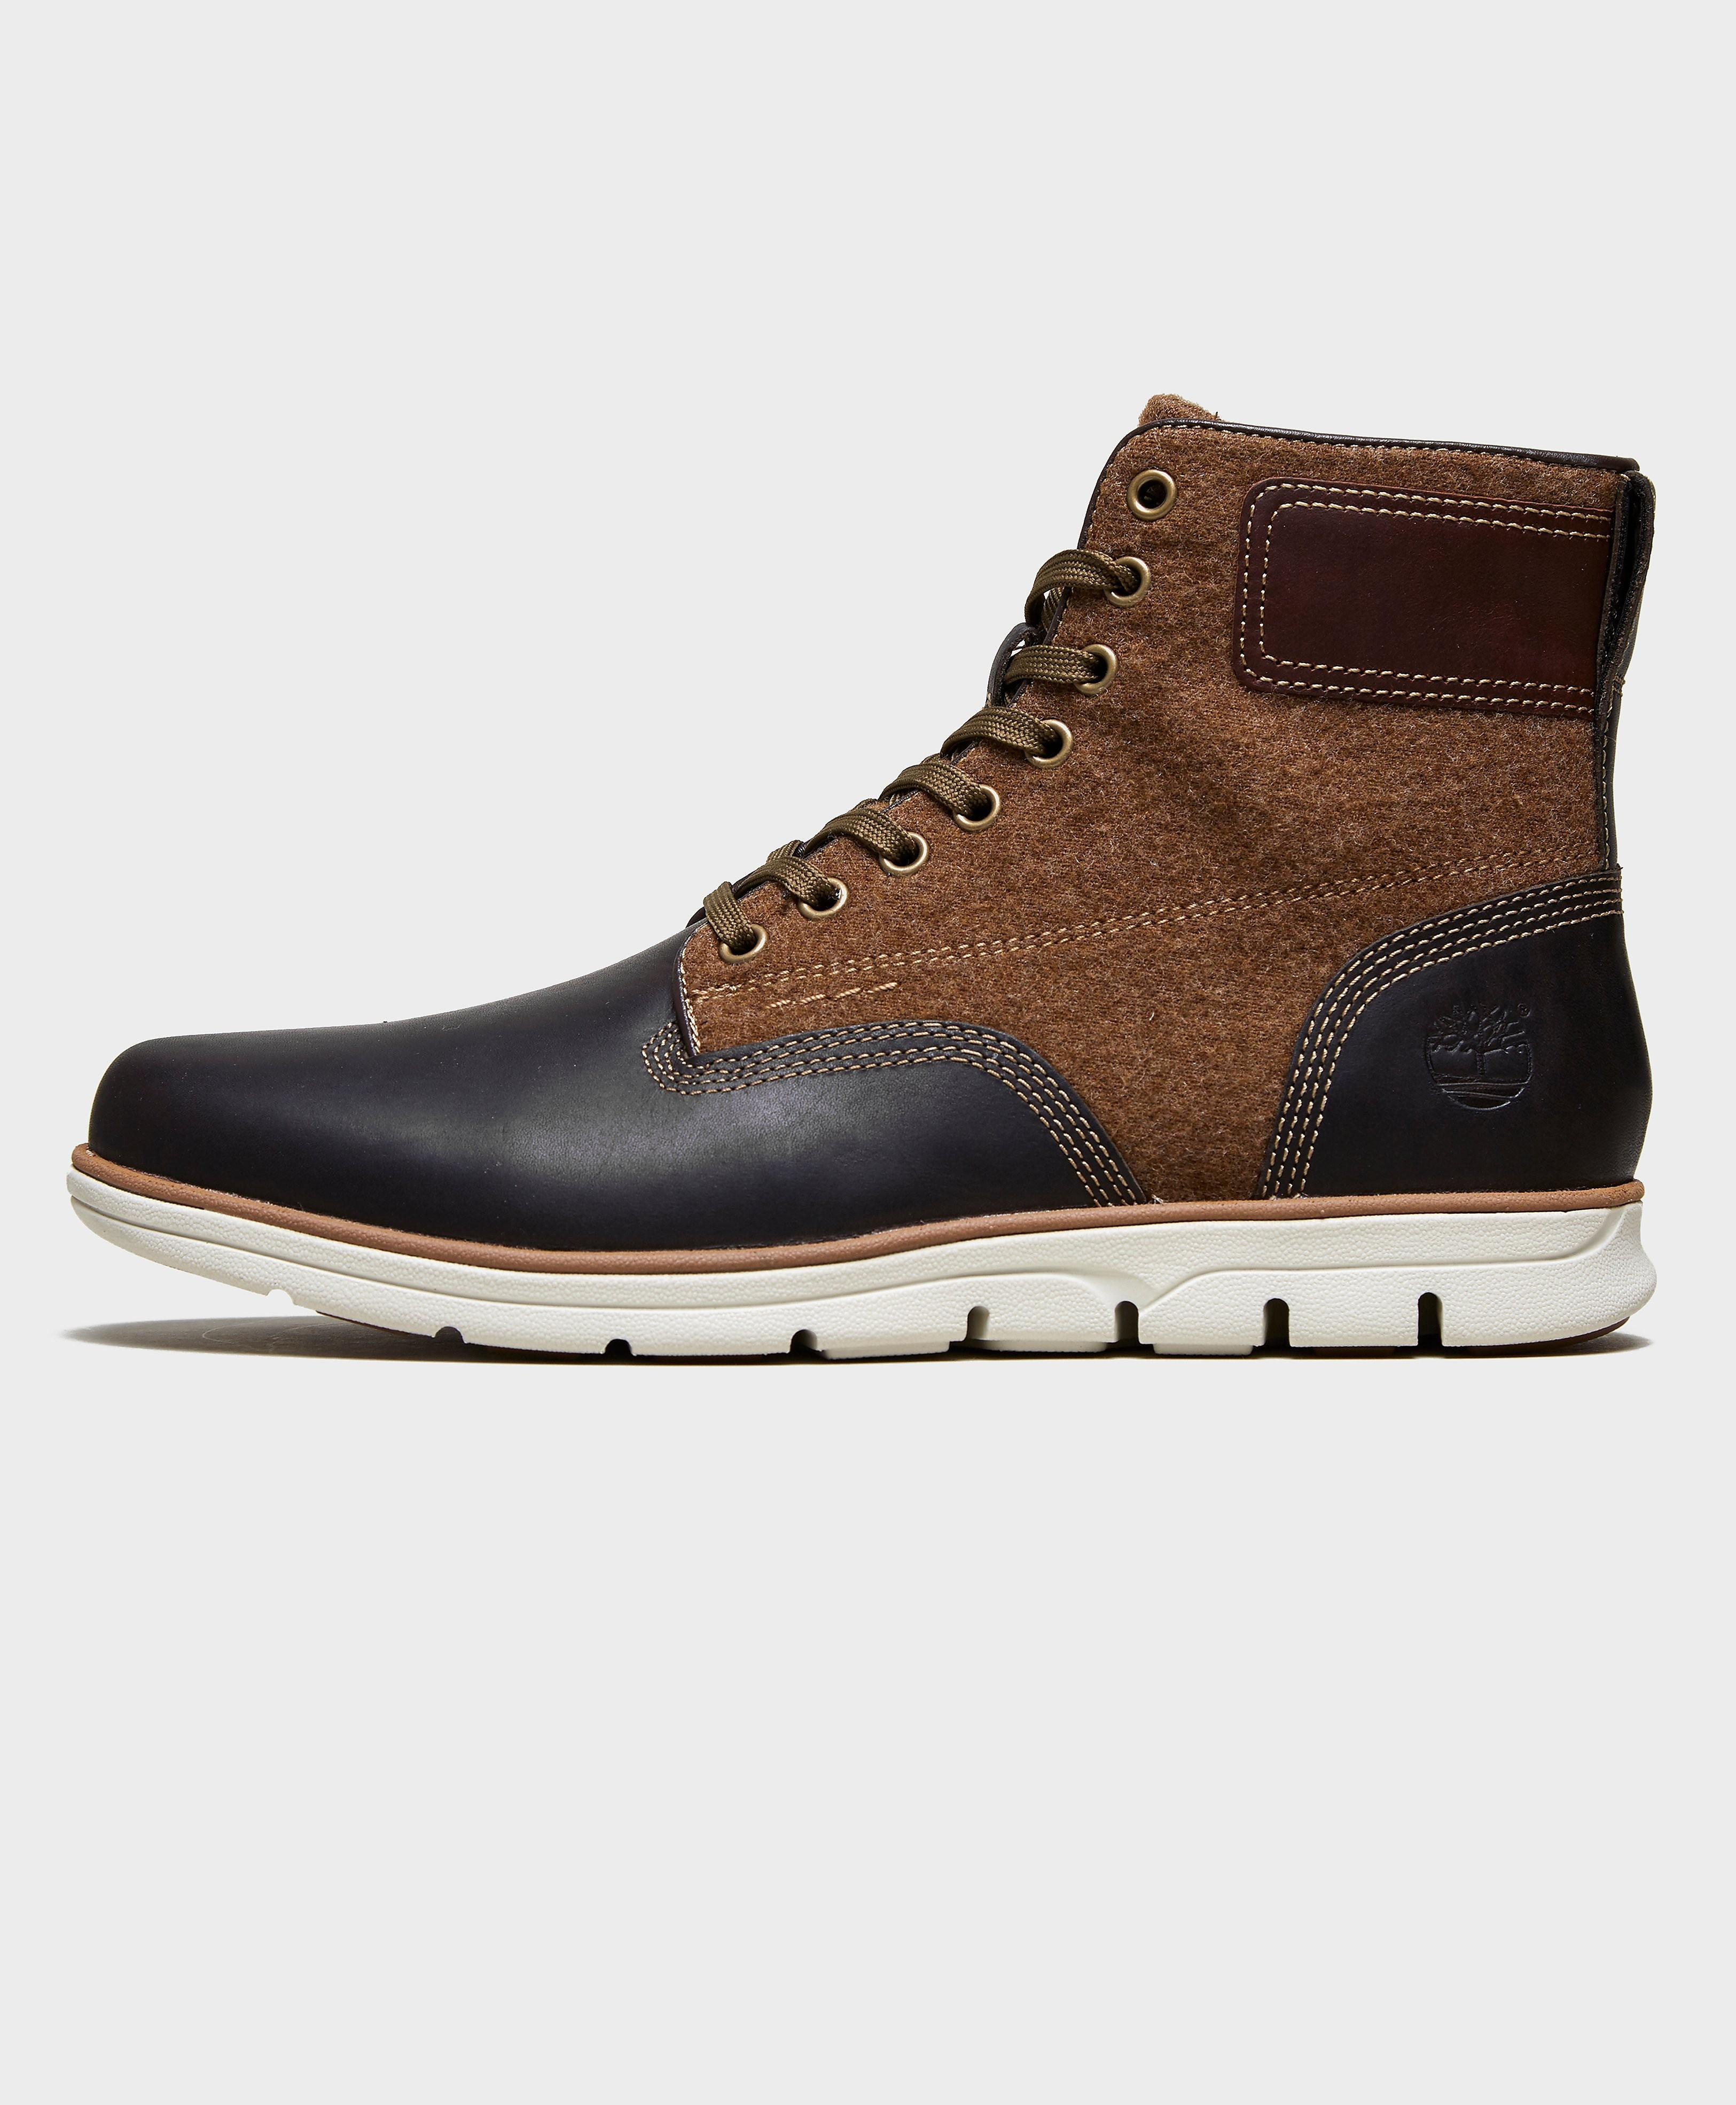 Timberland Bradstreet Mix Chukka Boot